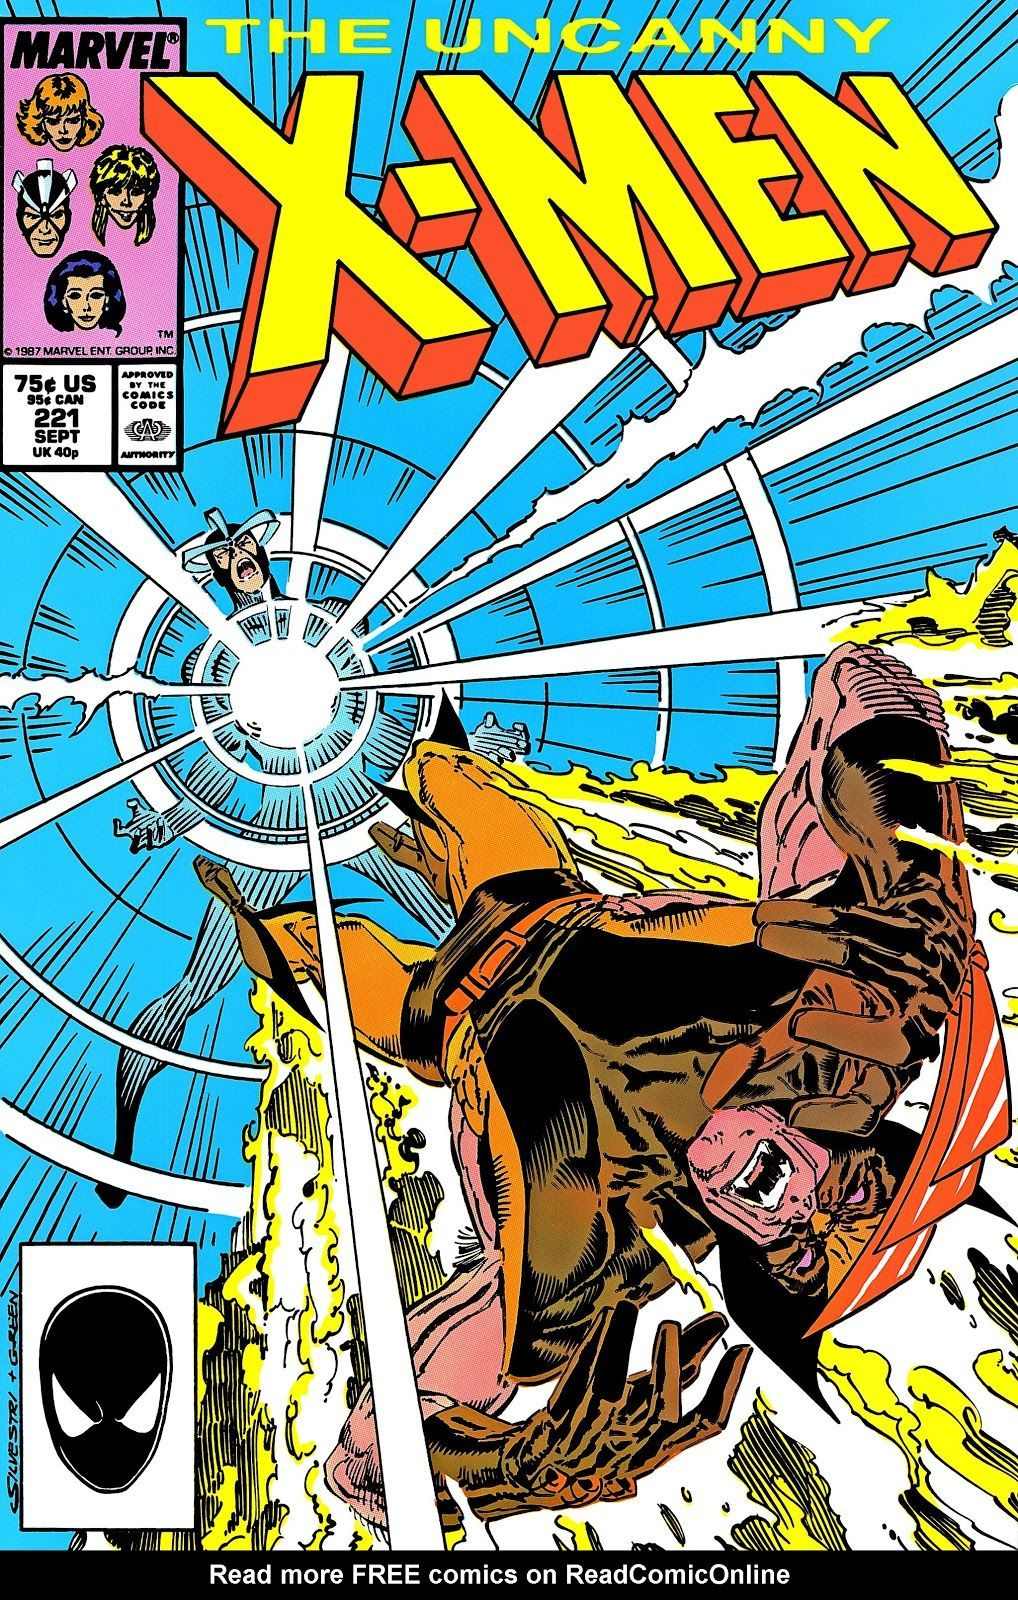 Uncanny X-Men #221 (Art by John Byrne, Written By Chris Claremont)